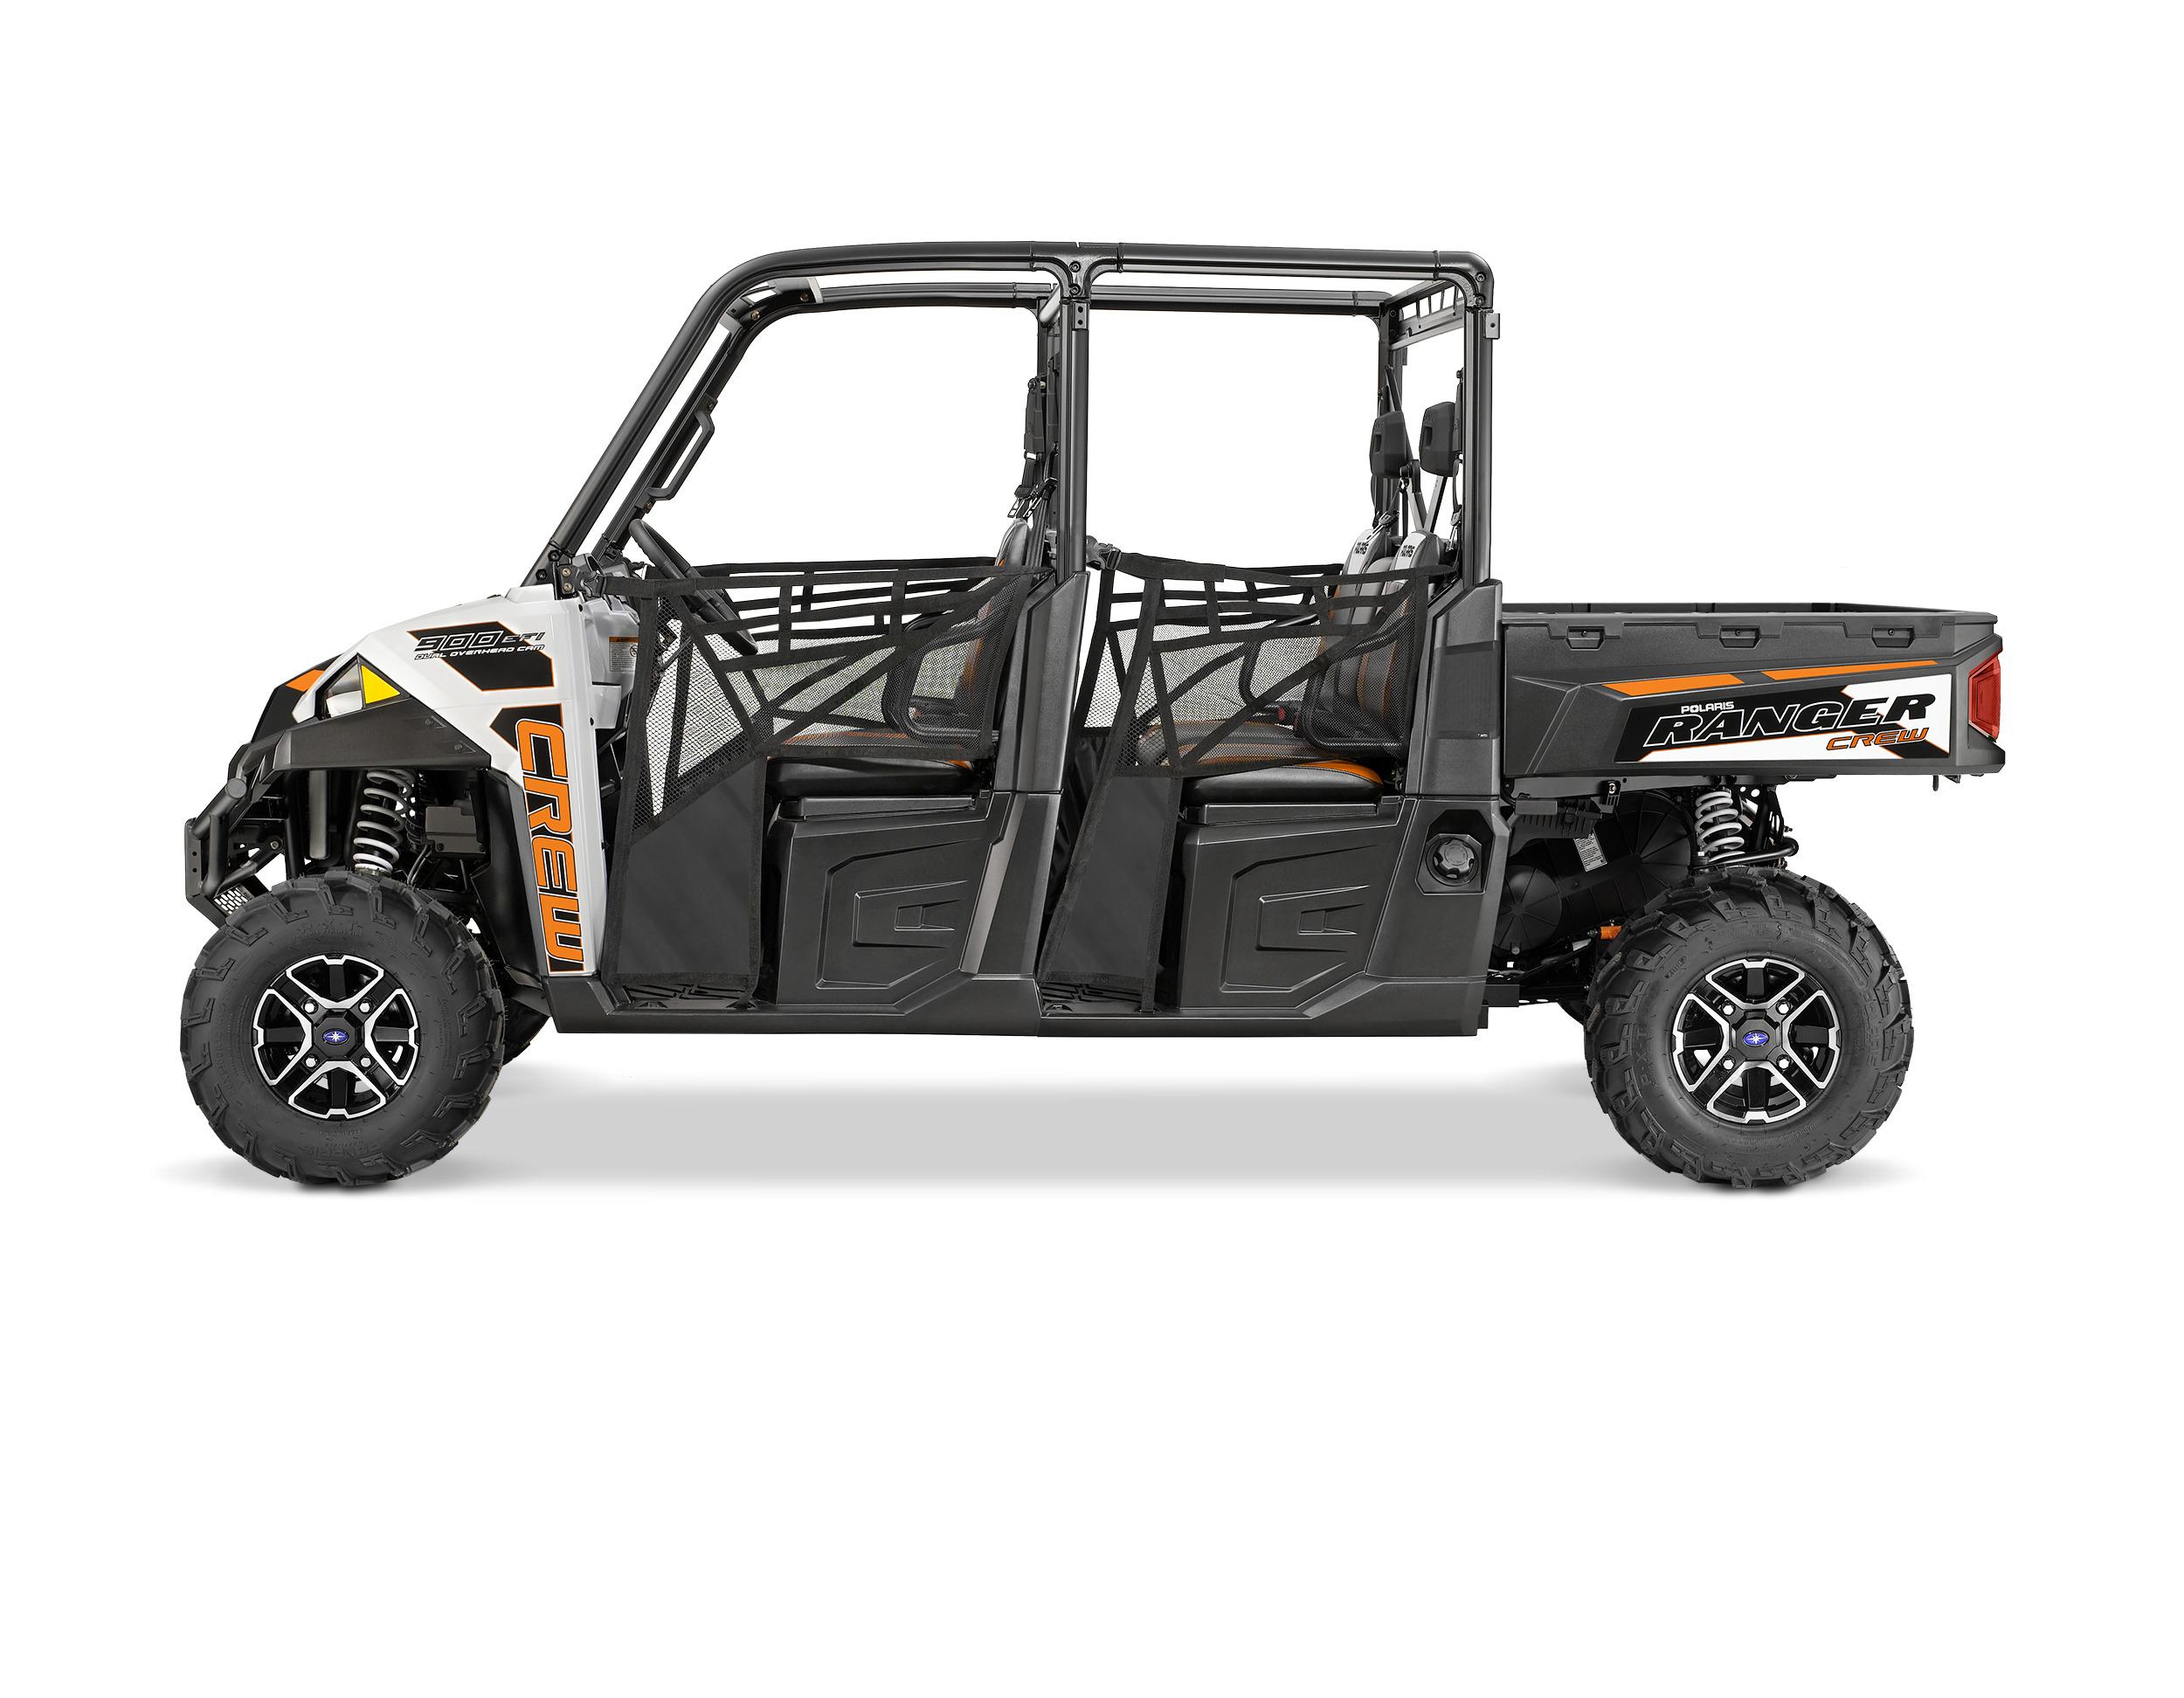 image of Polaris Ranger 900 recreational off-highway vehicles (ROVs)